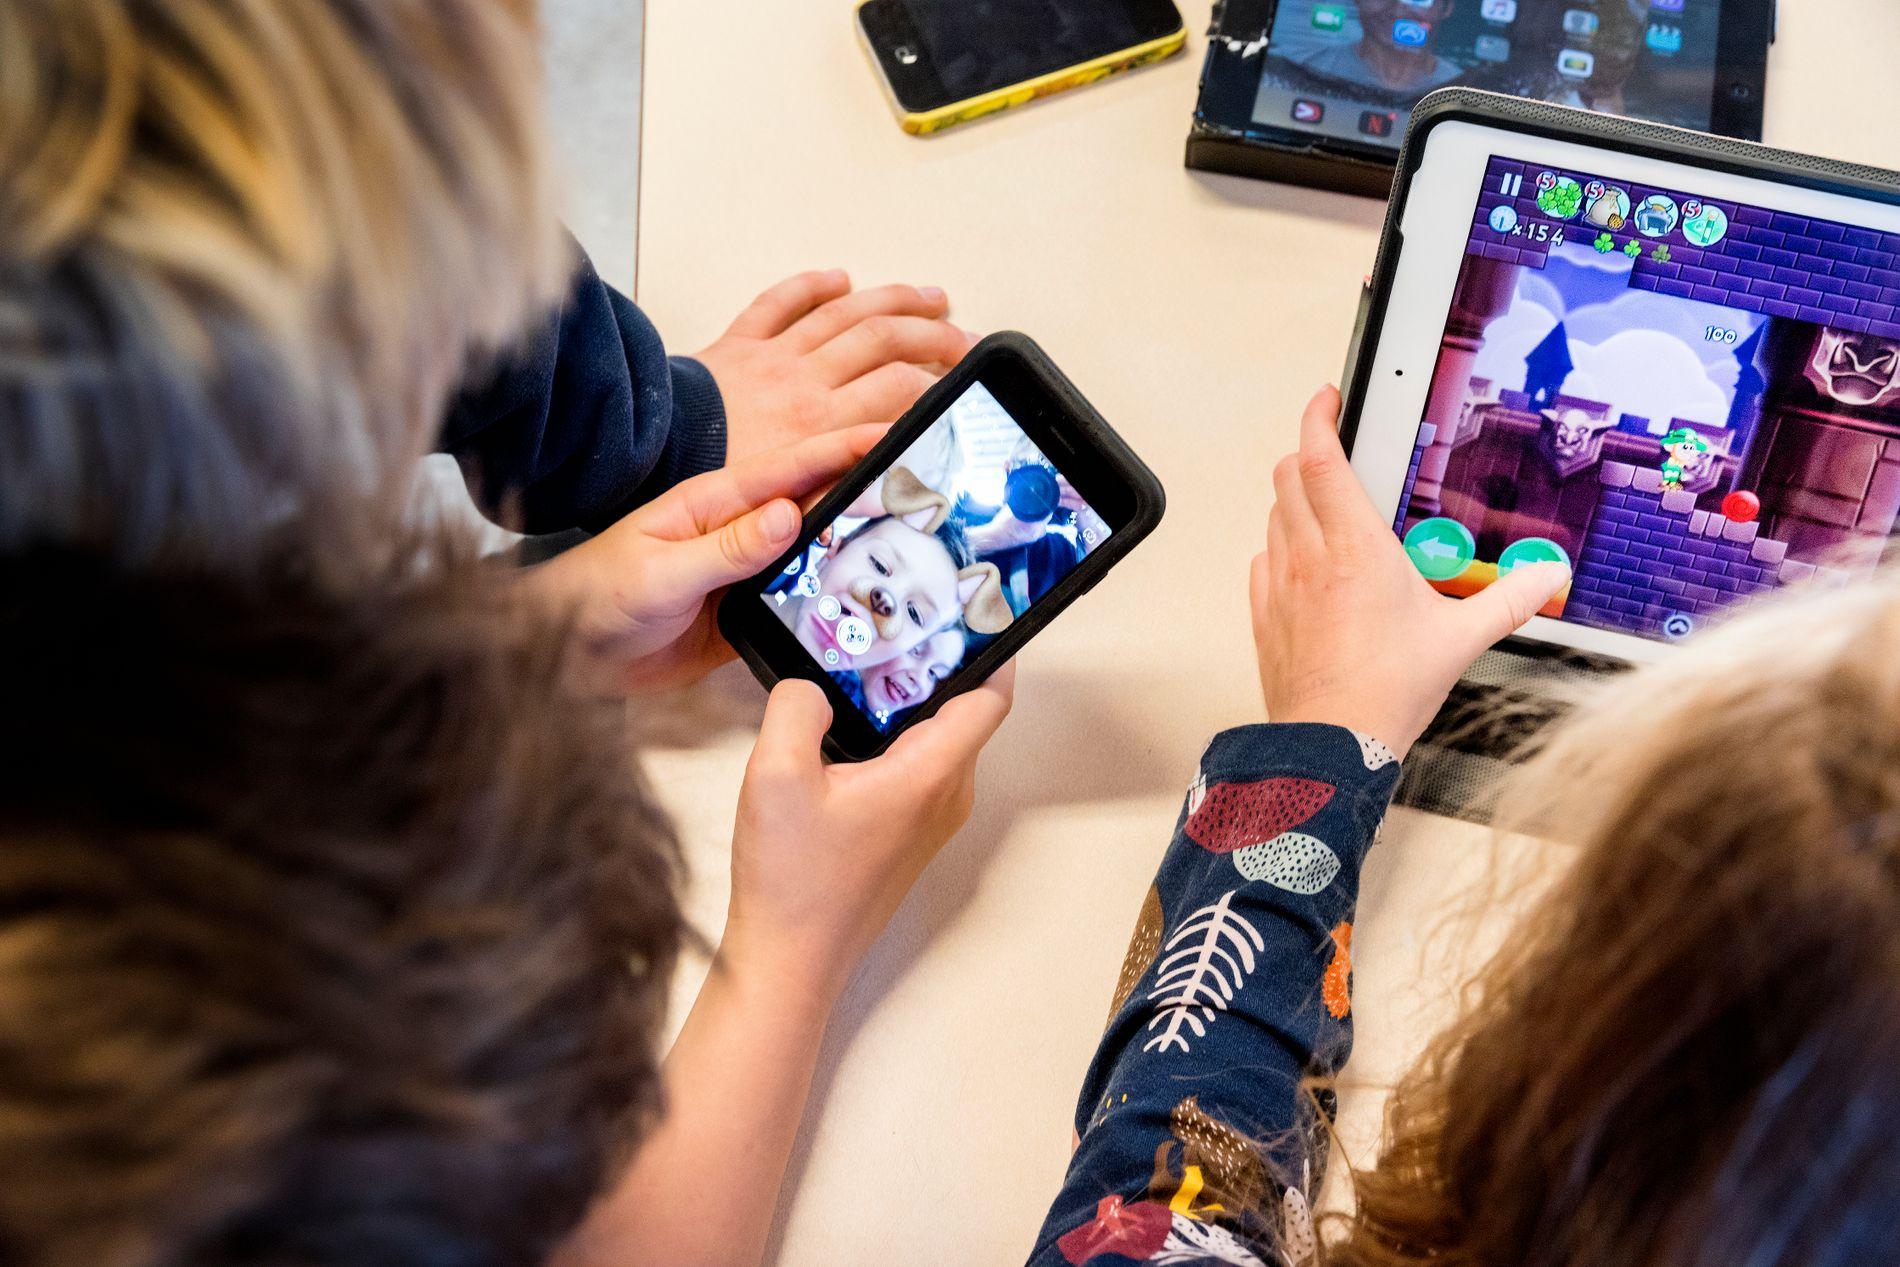 FORBUD: Flere skoler i Norge har allerede helt eller delvis innført forbud mot mobilbruk.